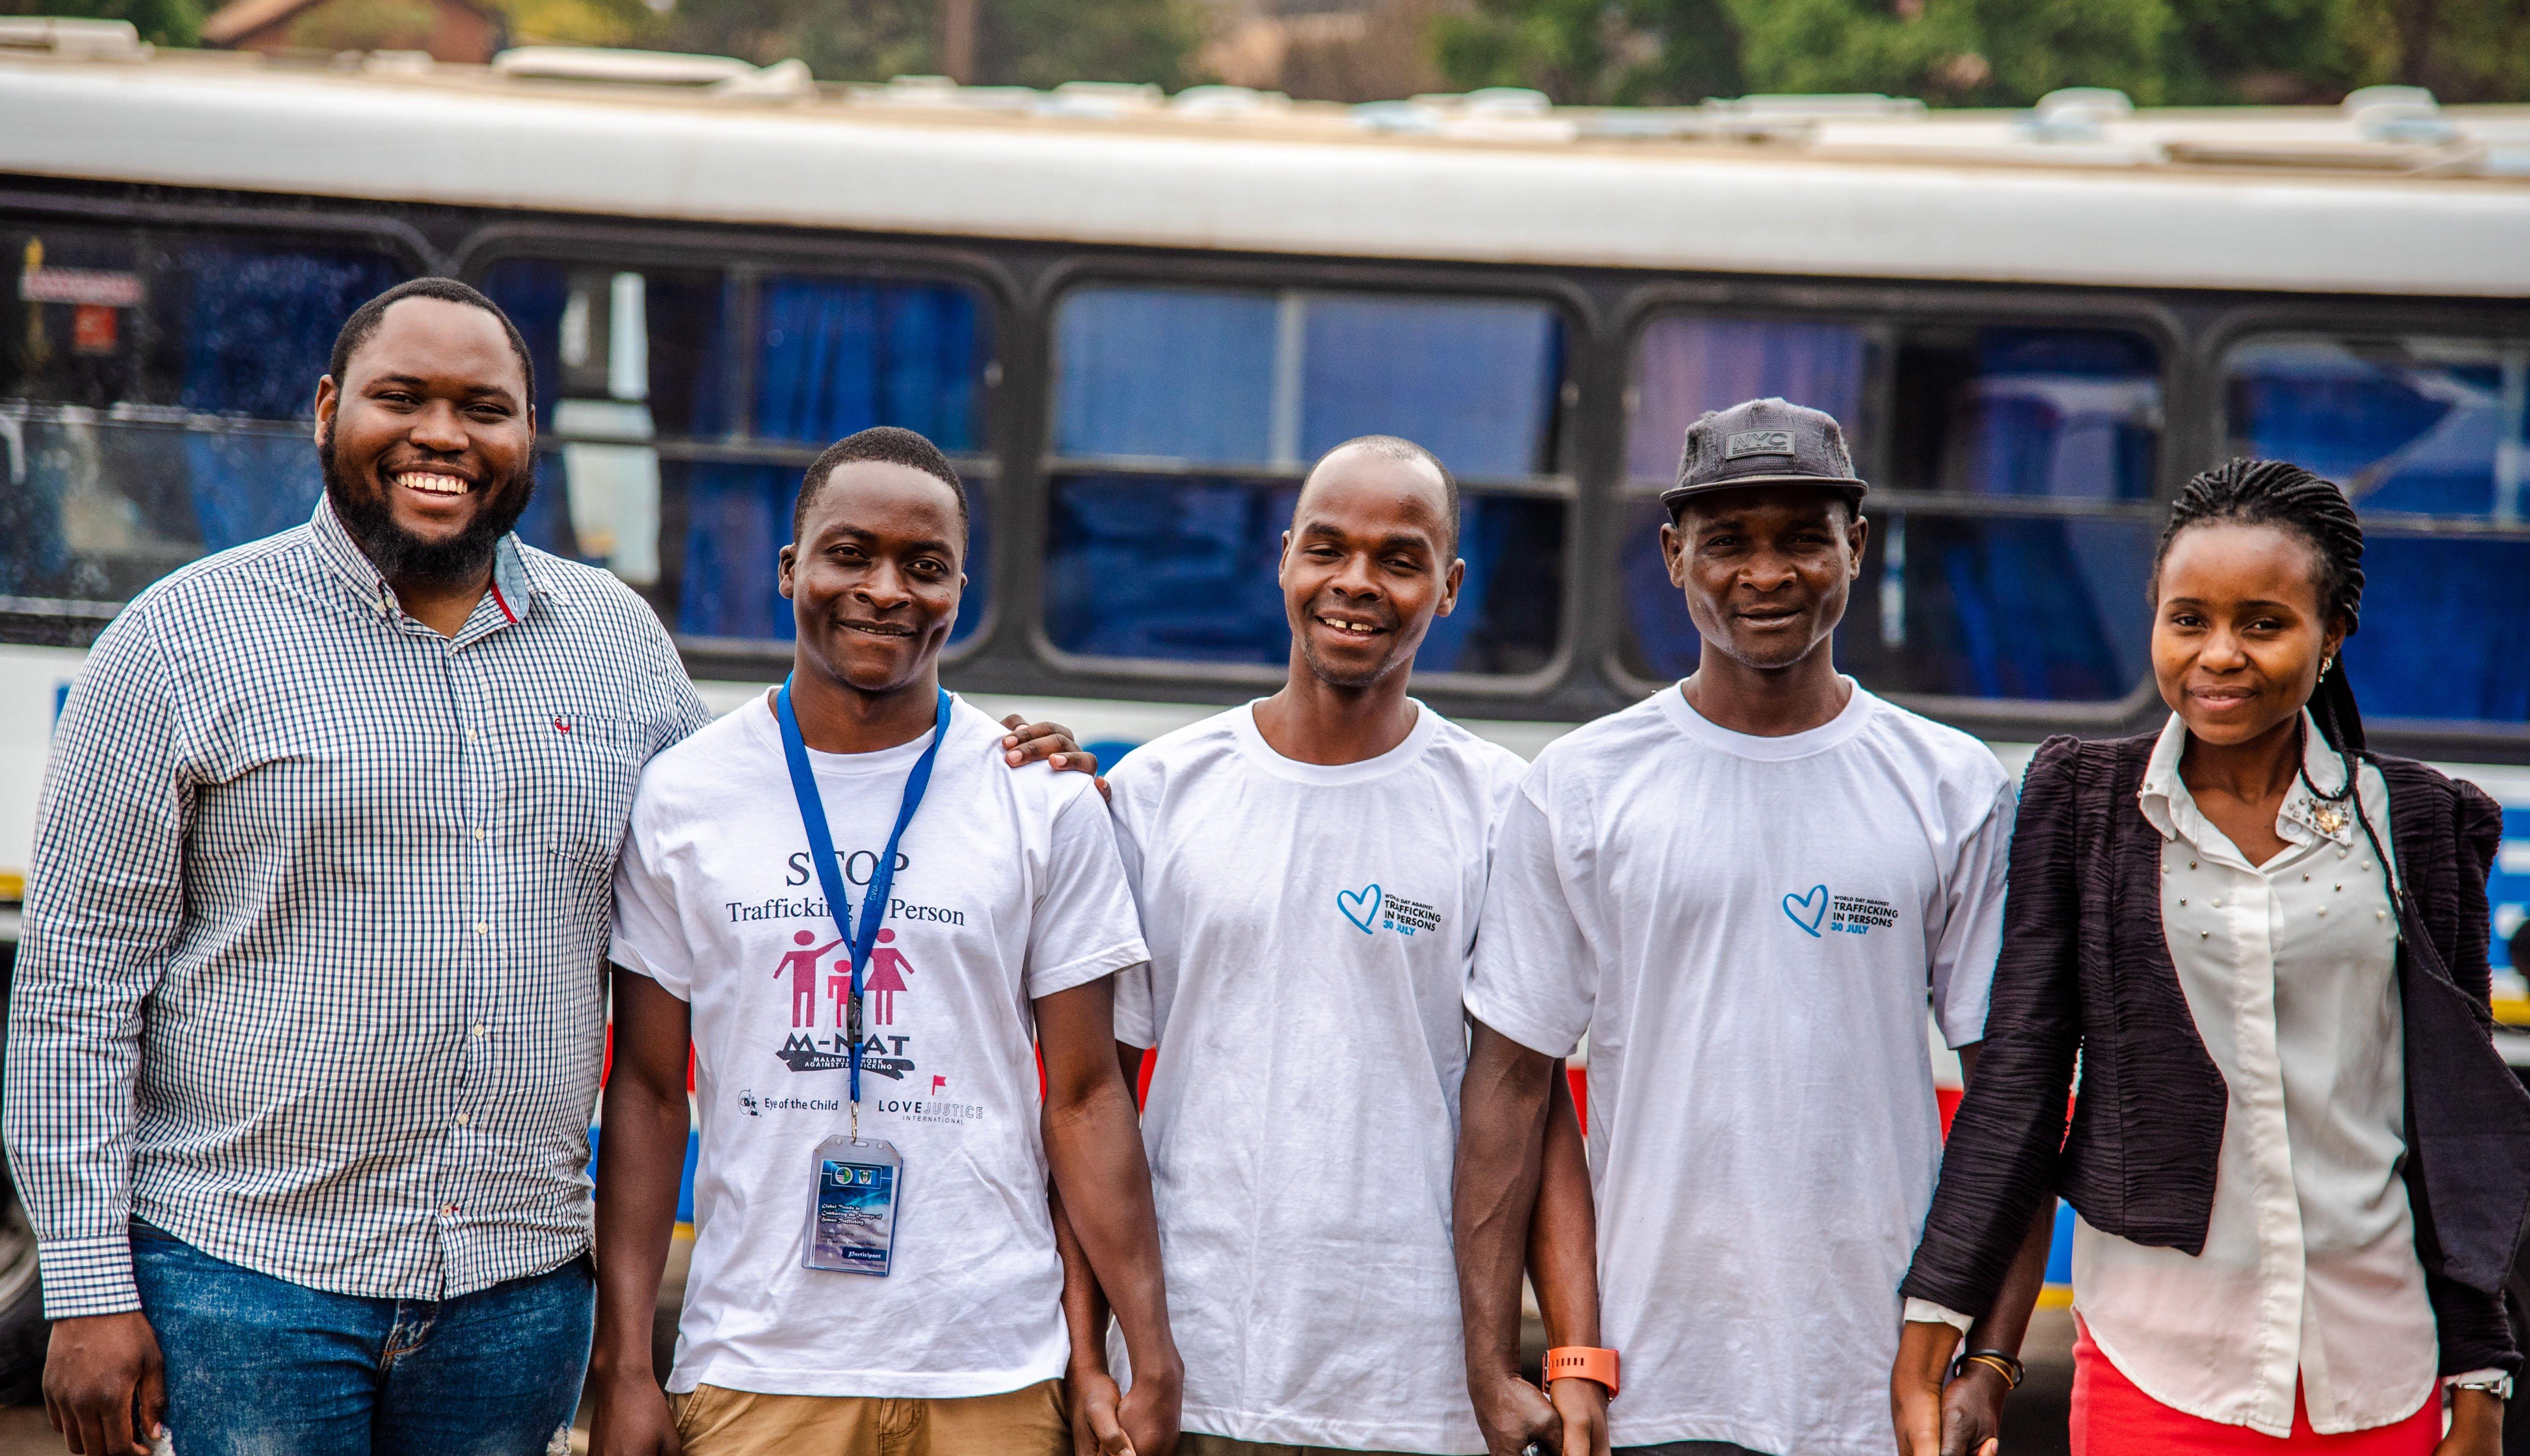 malawi_love_justice_staff_4